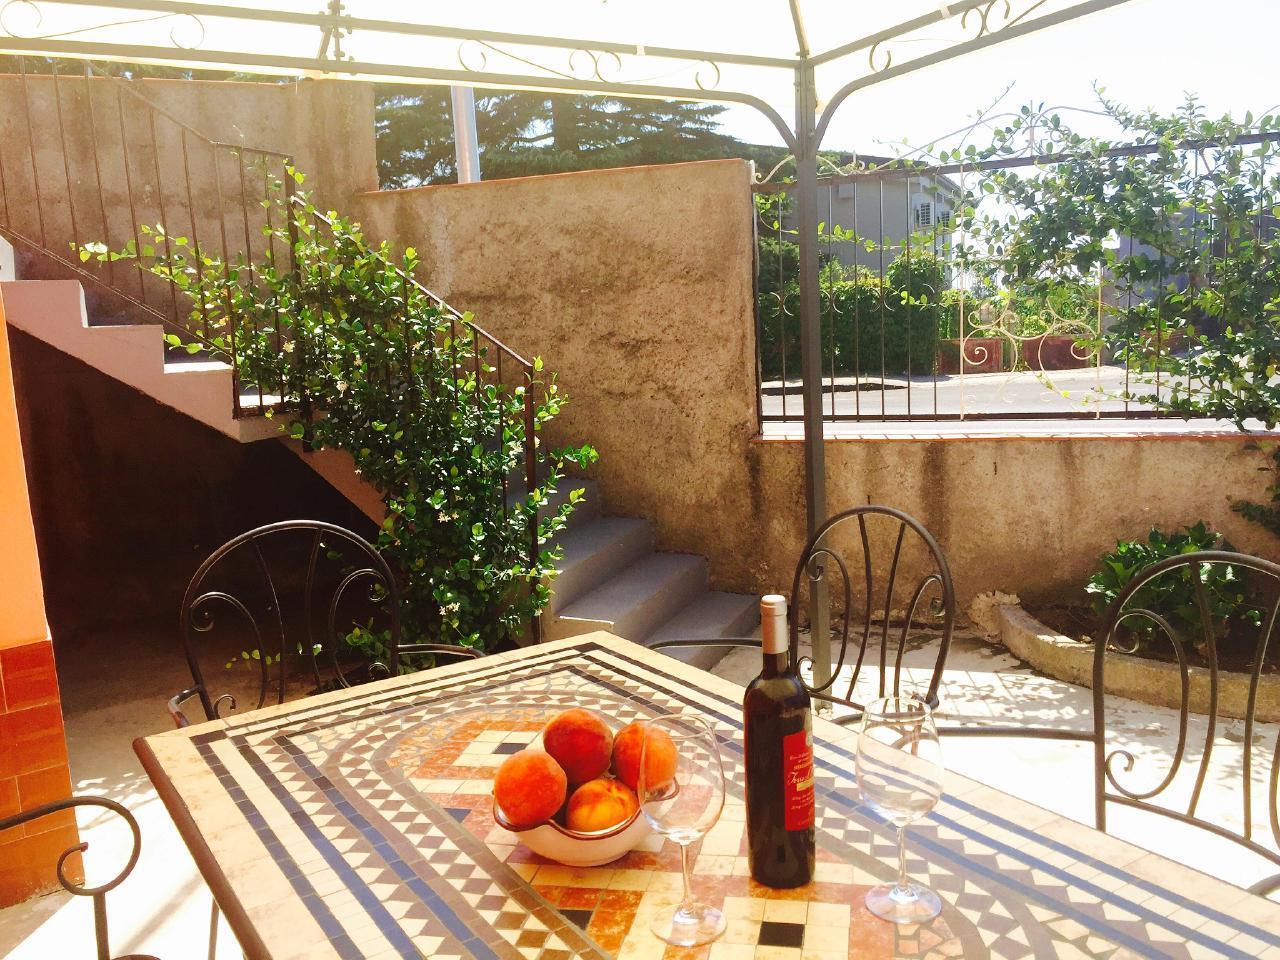 Maison de vacances Etna Dimora dei Saponari (2170785), Trecastagni, Catania, Sicile, Italie, image 4